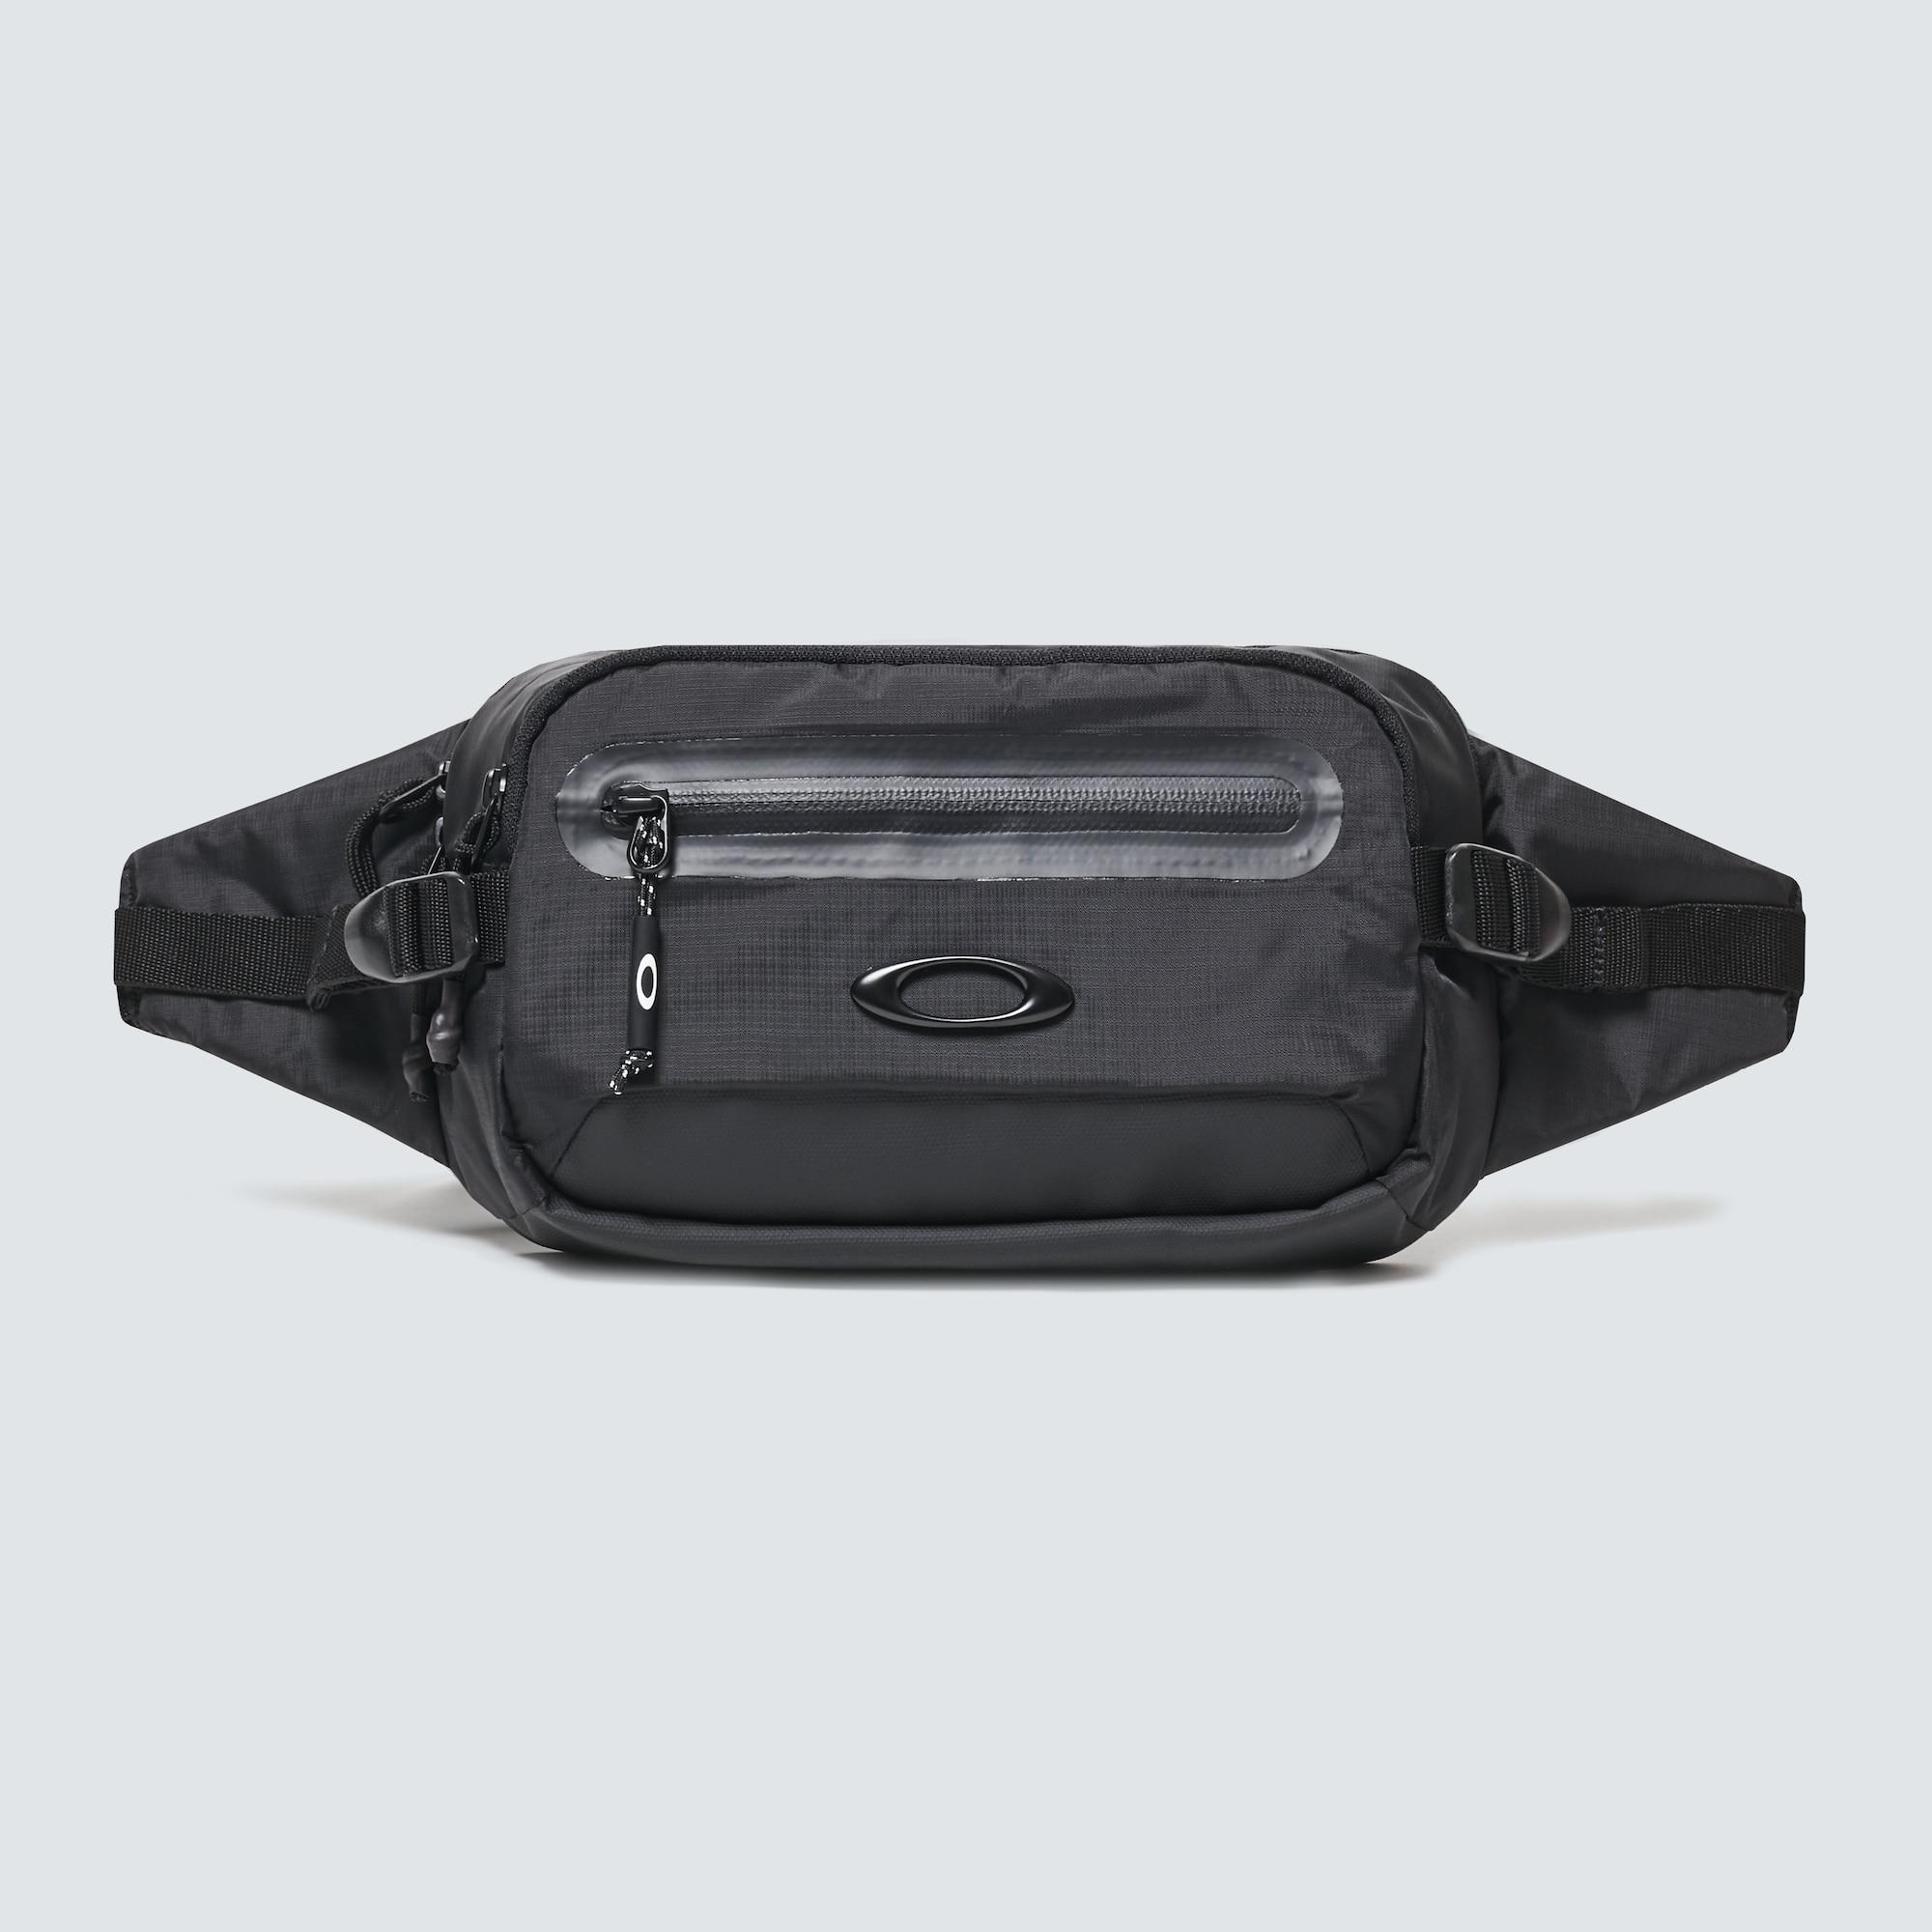 Riñonera Outdoor Belt Bag